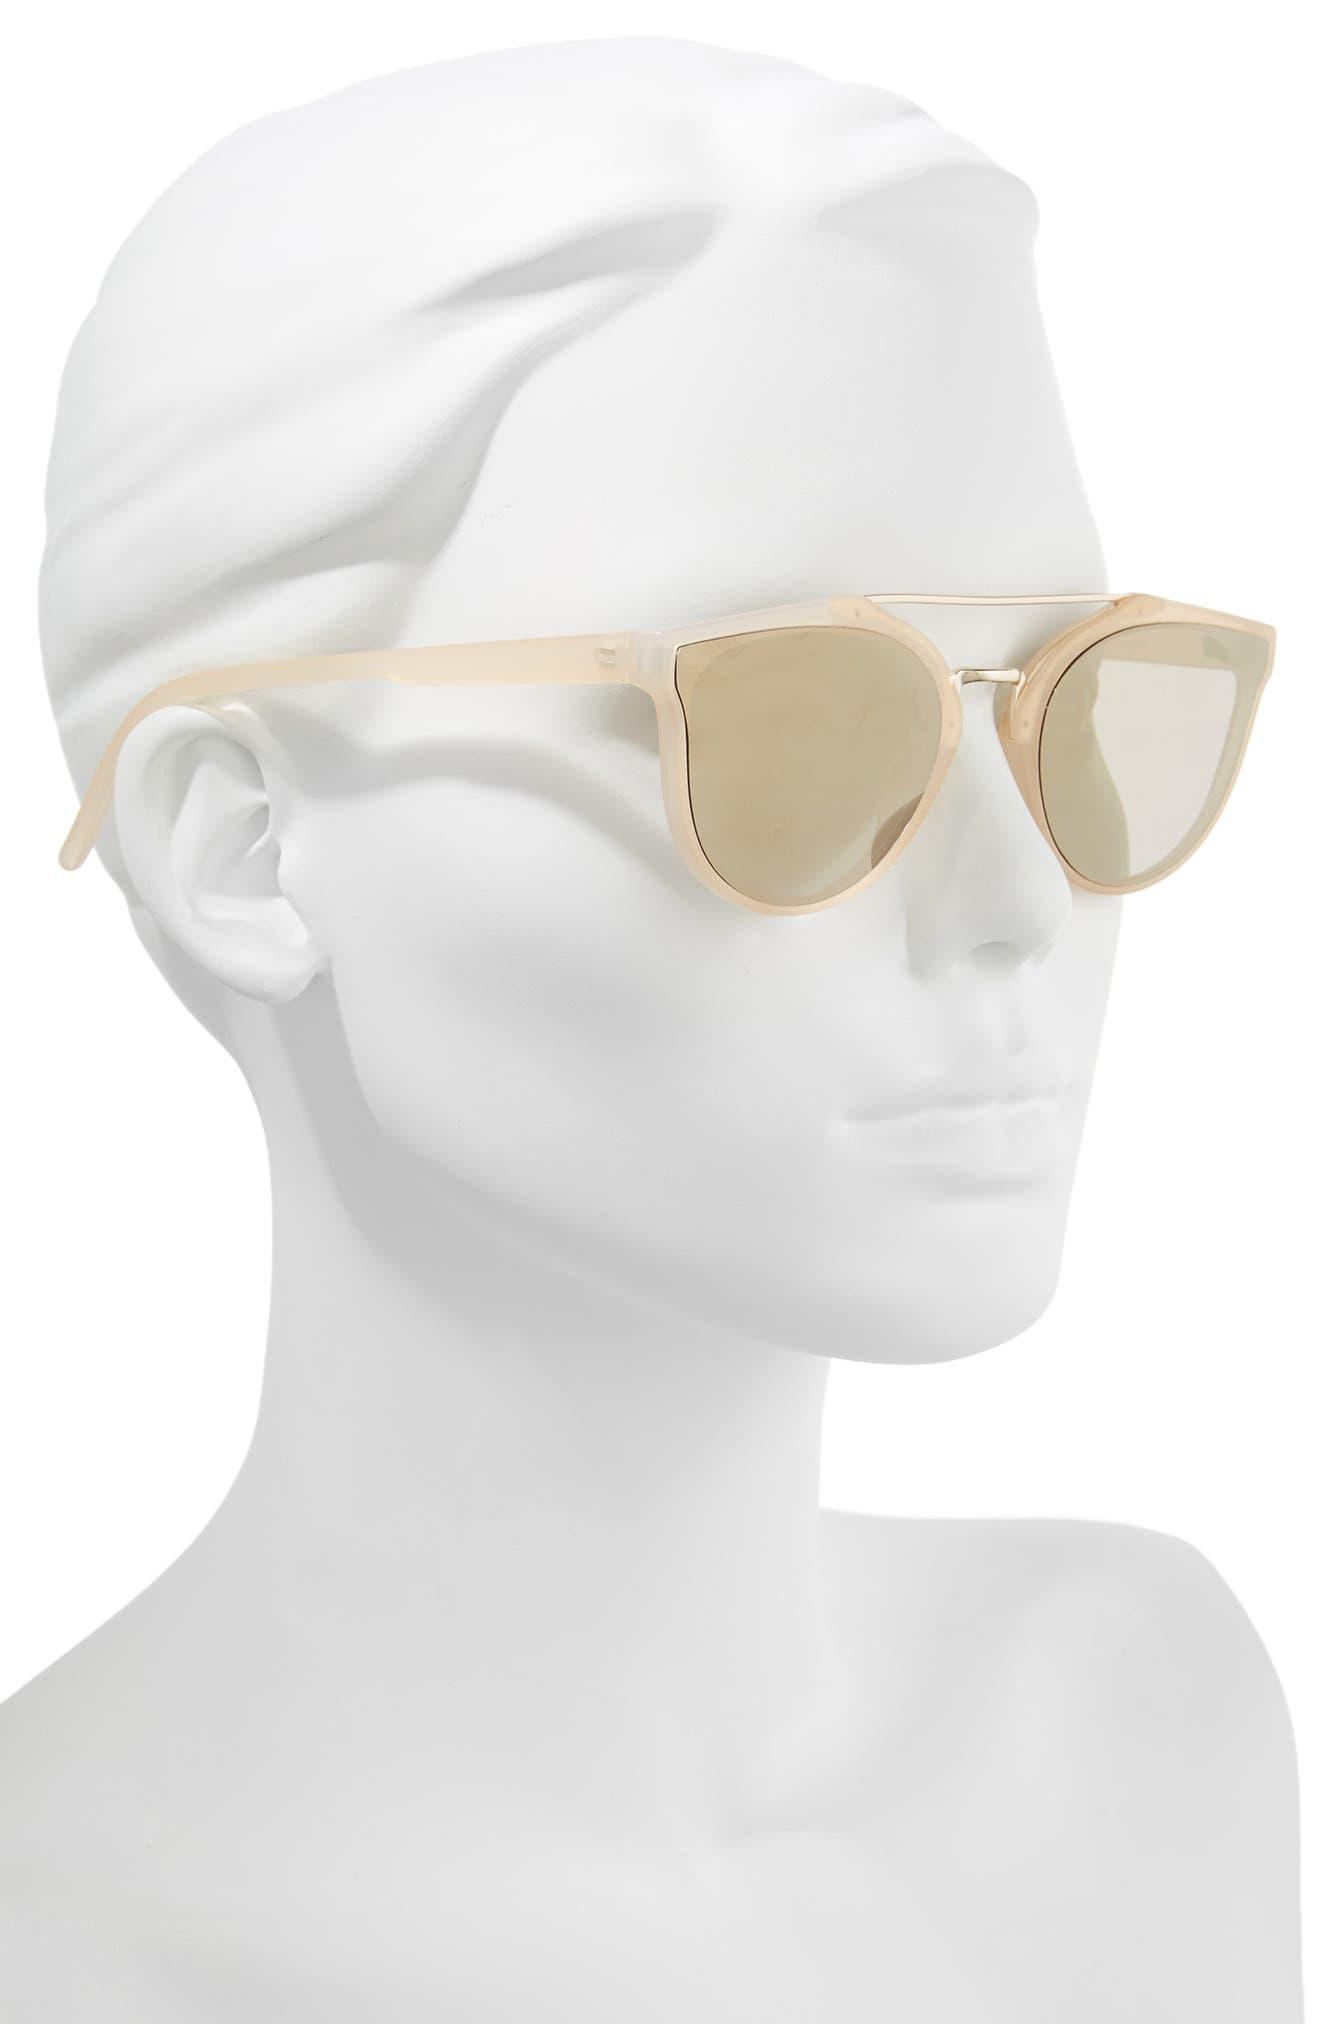 Aviator Sunglasses,                             Alternate thumbnail 2, color,                             Milky Peach/ Gold